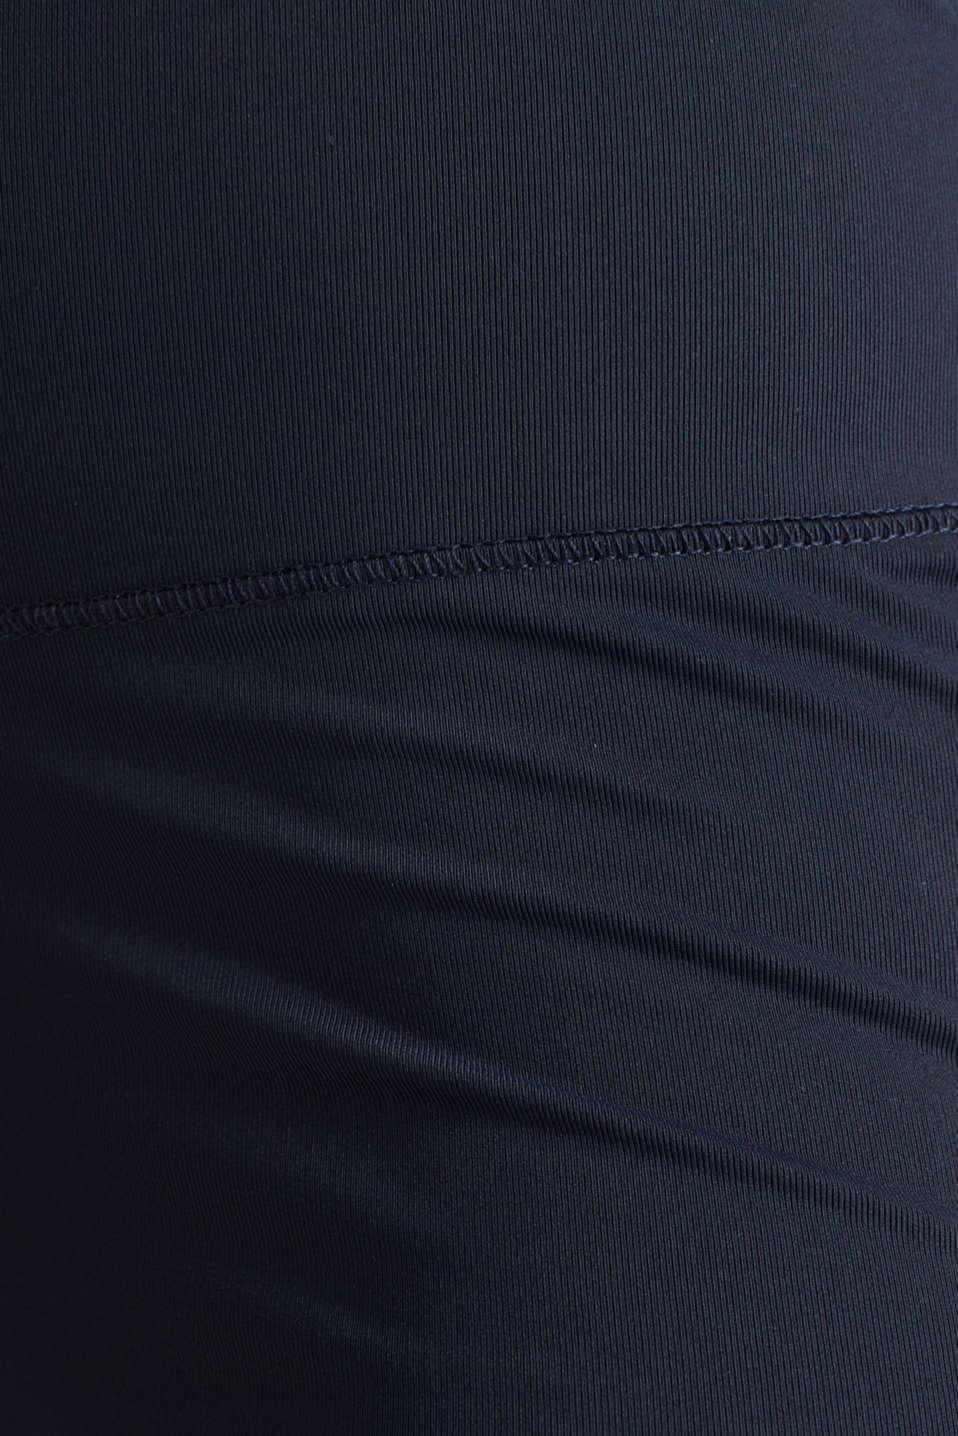 Leggings with polka dot details, E-DRY, NAVY 2, detail image number 3